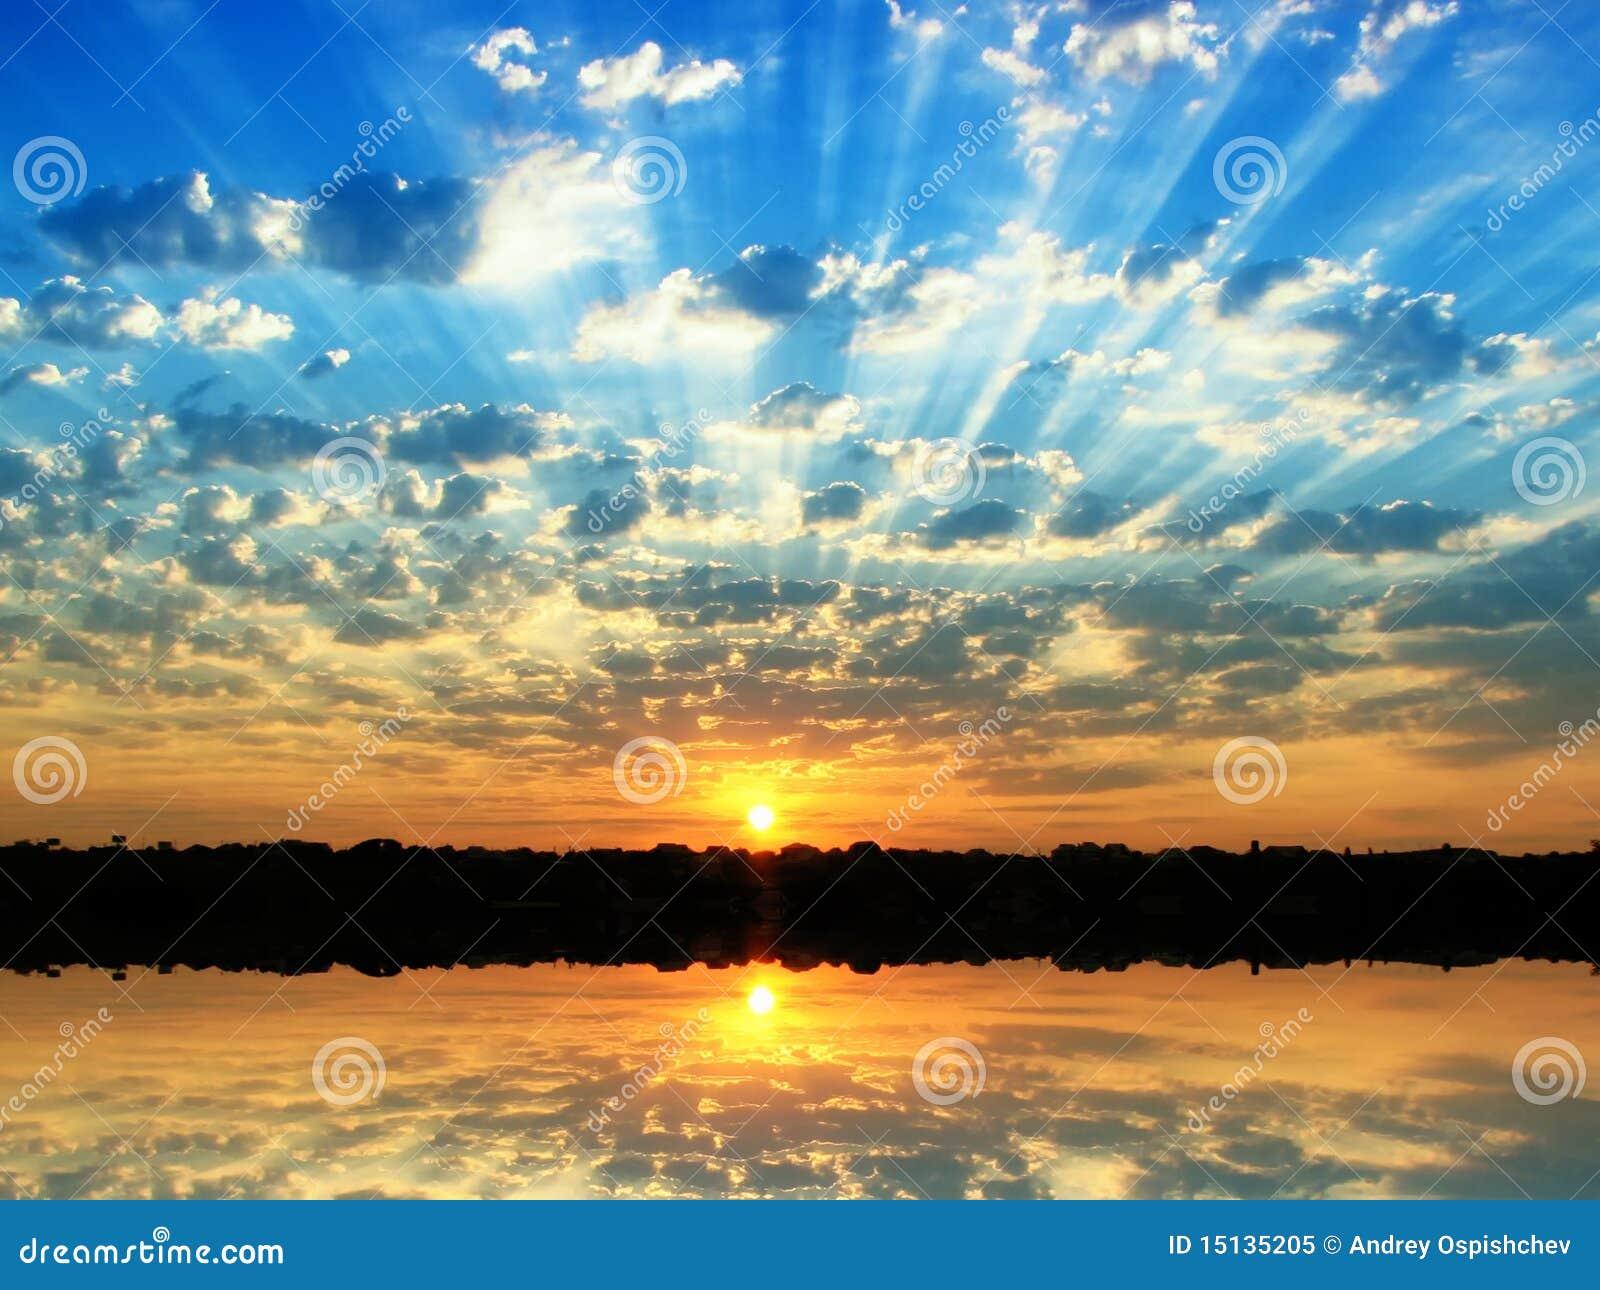 Citaten Zomer Gratis : De zonsopgang van zomer royalty vrije stock foto